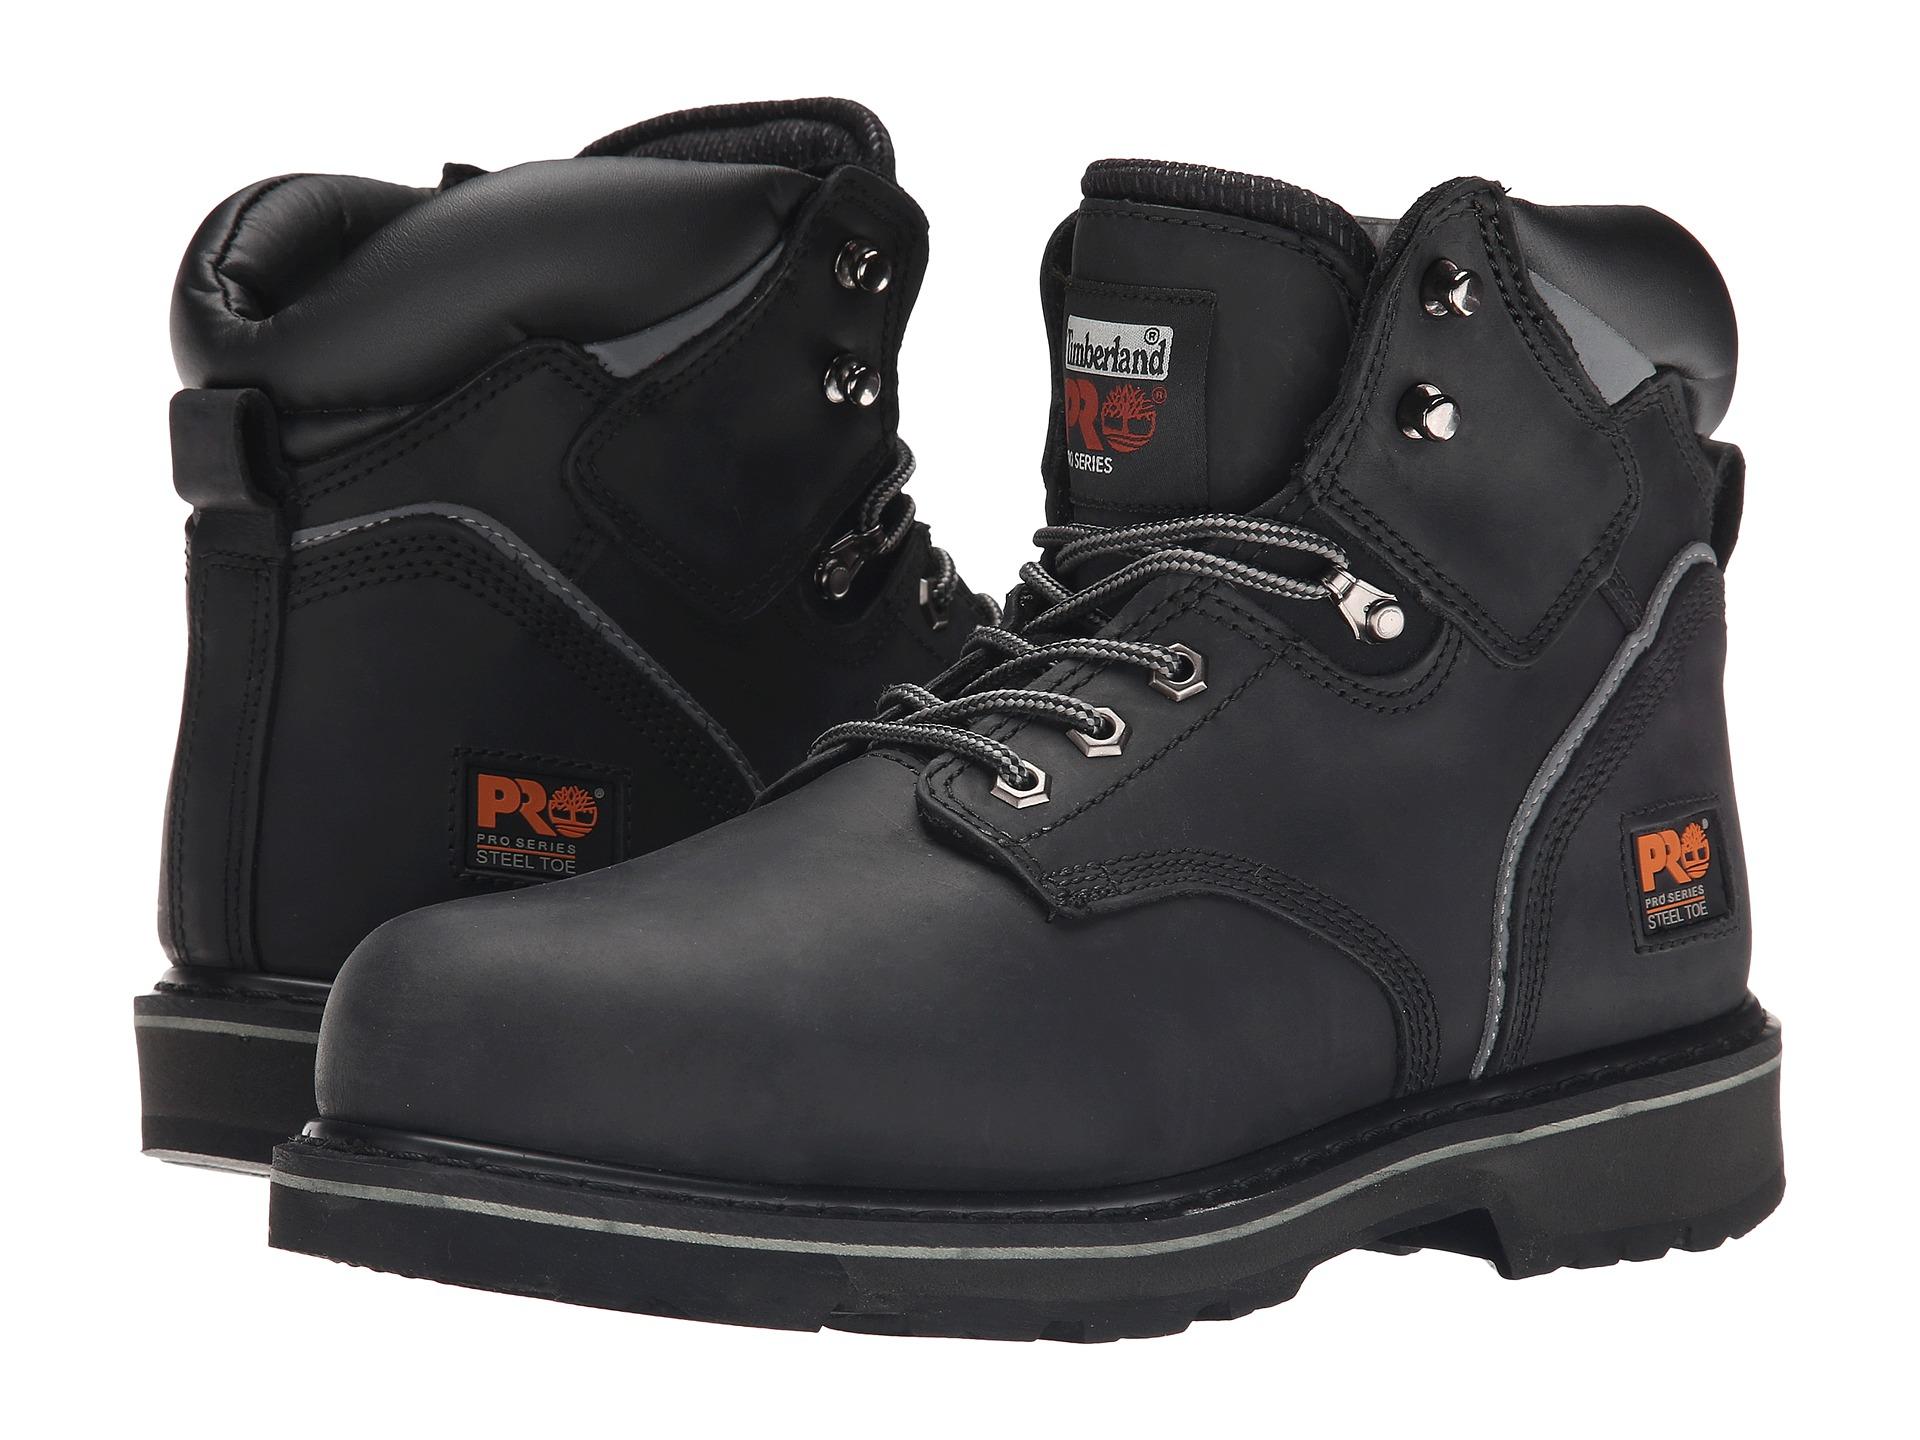 Timberland PRO 6&quot Pit Boss Steel Toe - Zappos.com Free Shipping